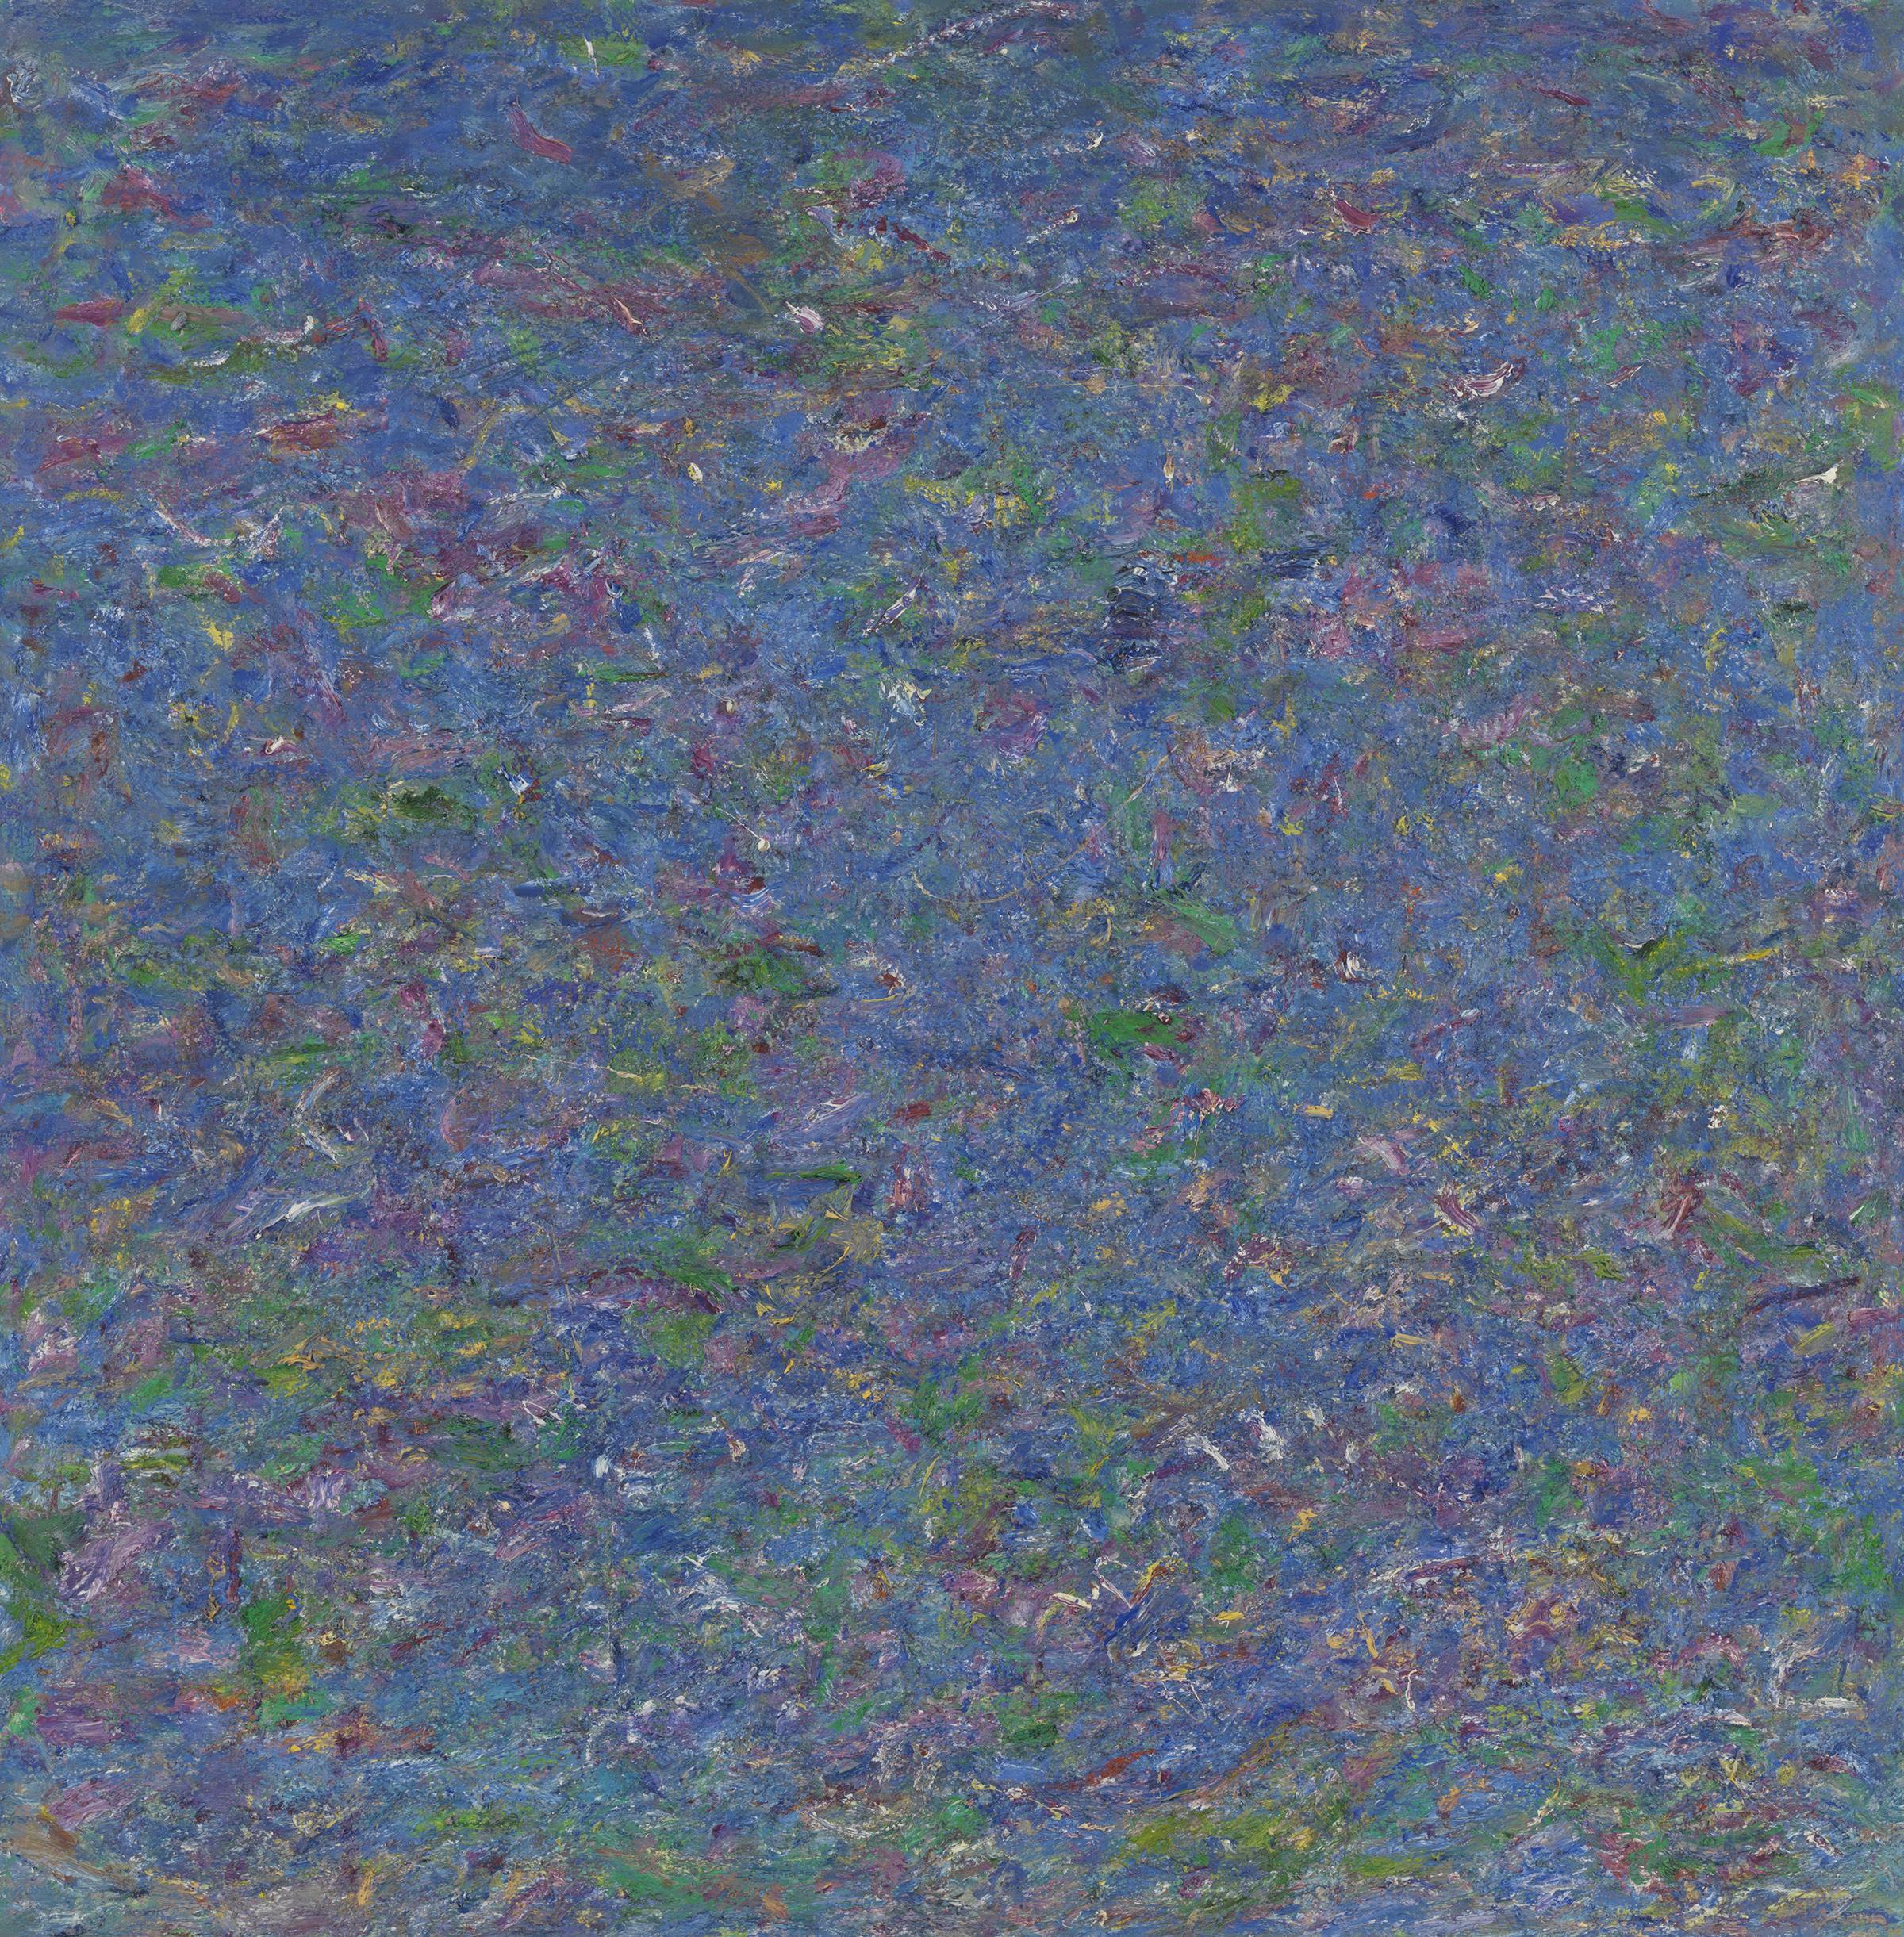 Pat Passlof  Isoceles , 1980 Oil on linen 78 x 79 inches